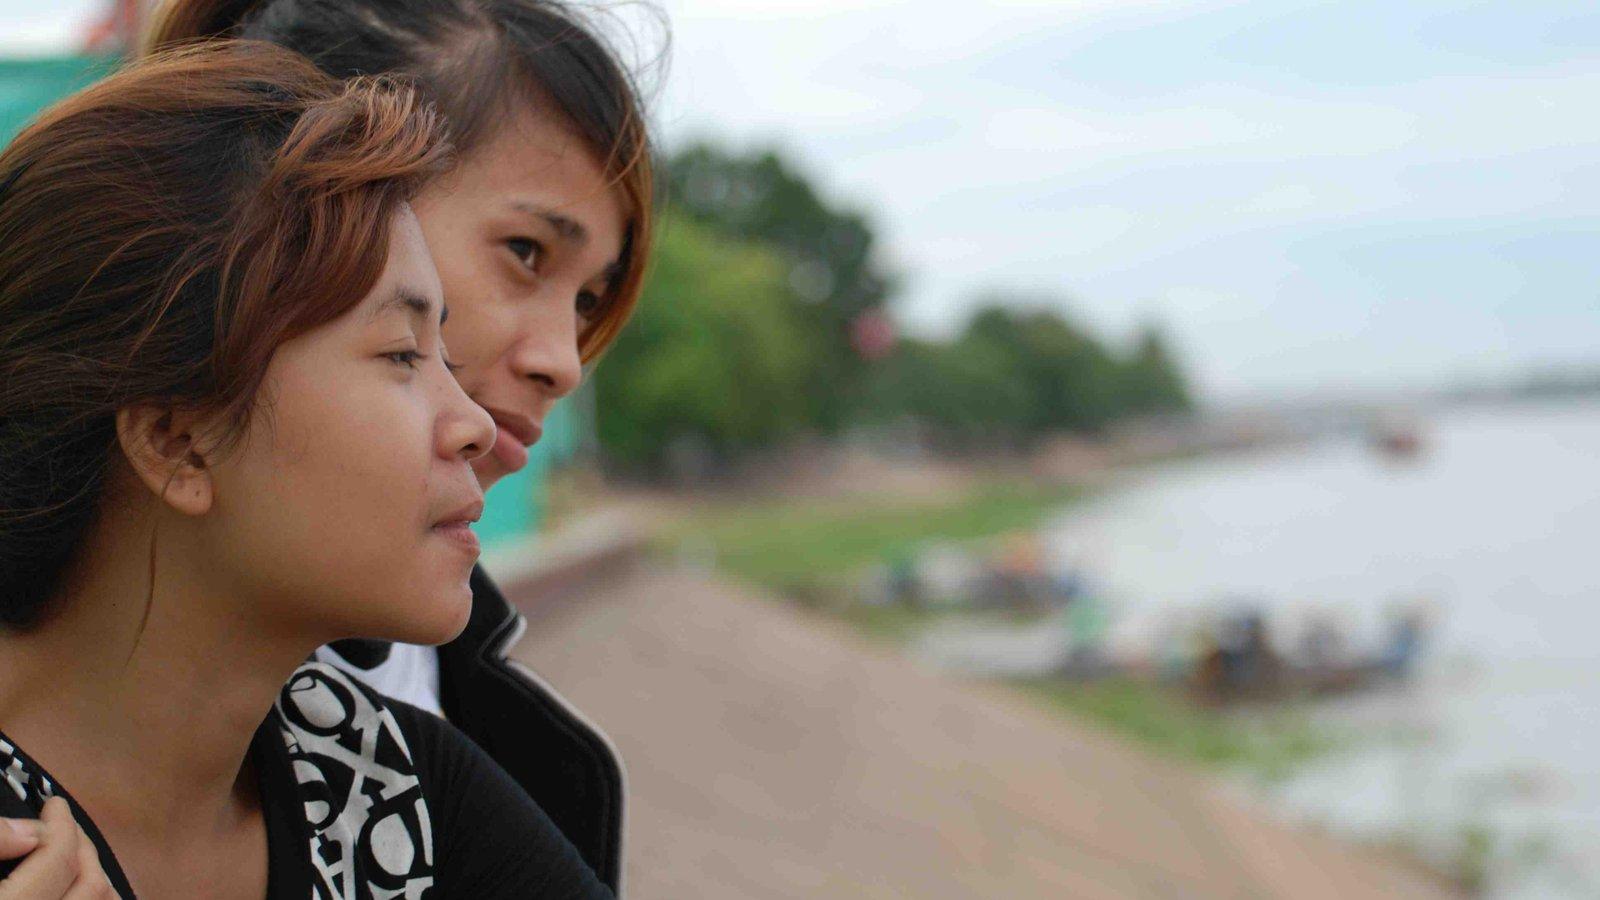 The Girls of Phnom Penh - Three Stories of Cambodia's Virginity Trade